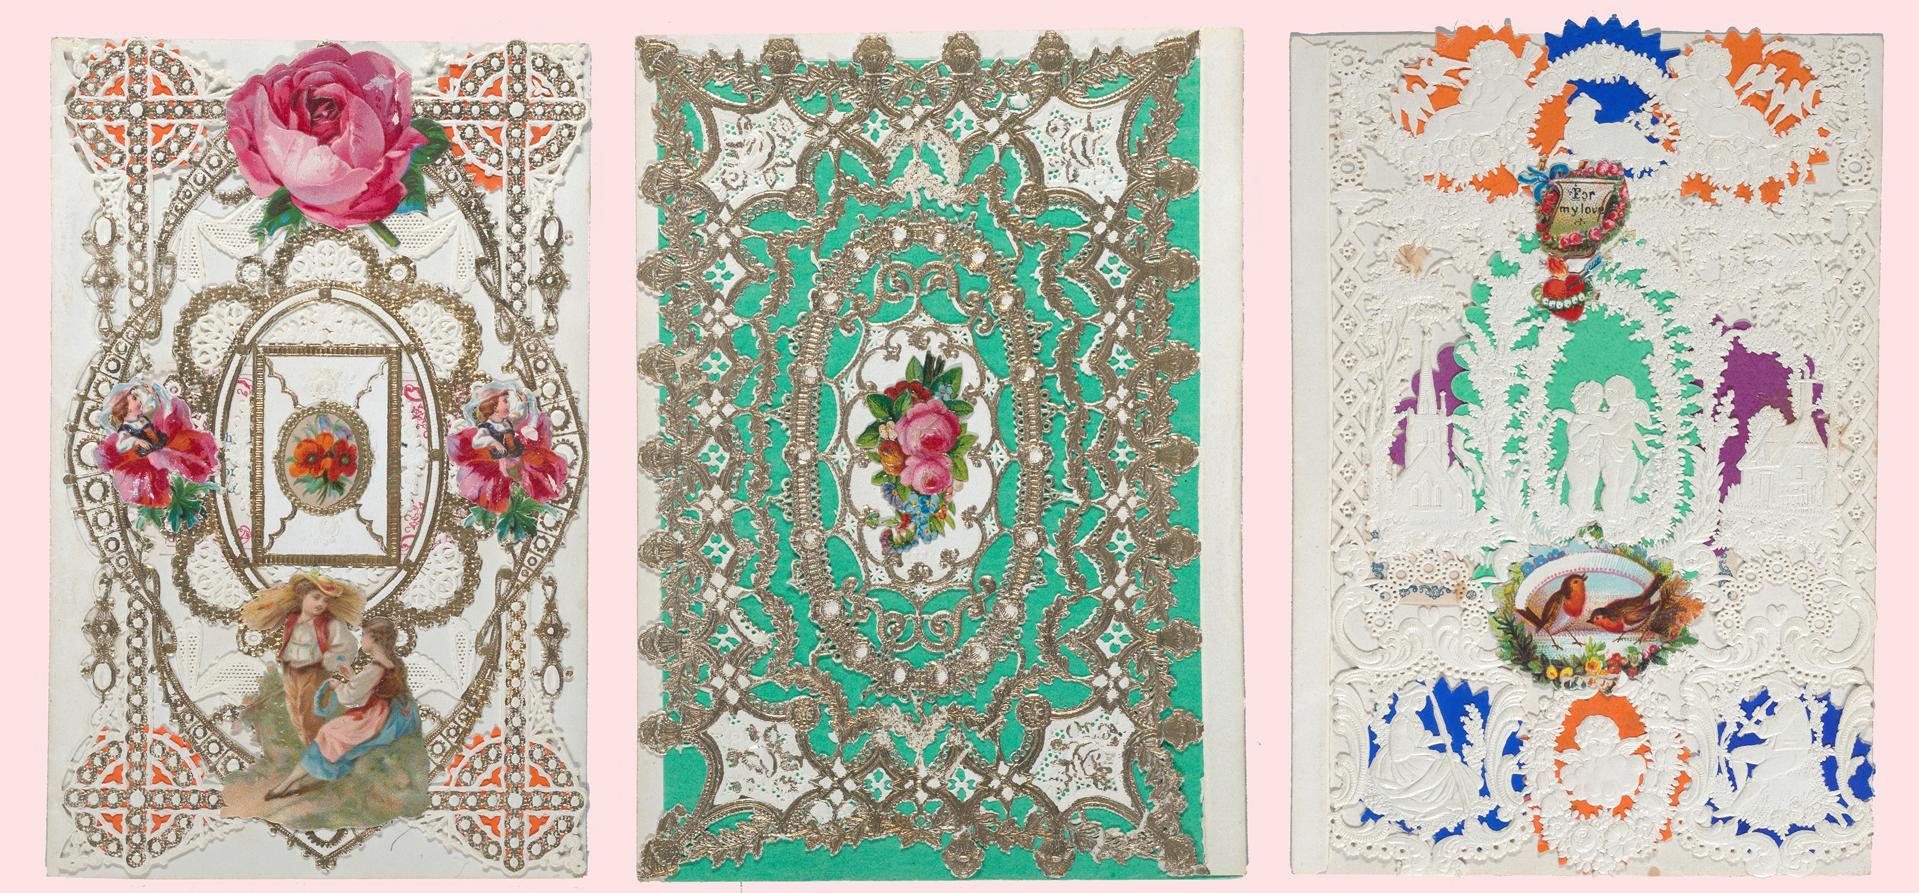 esther-howland-valentine-three-cards-pink